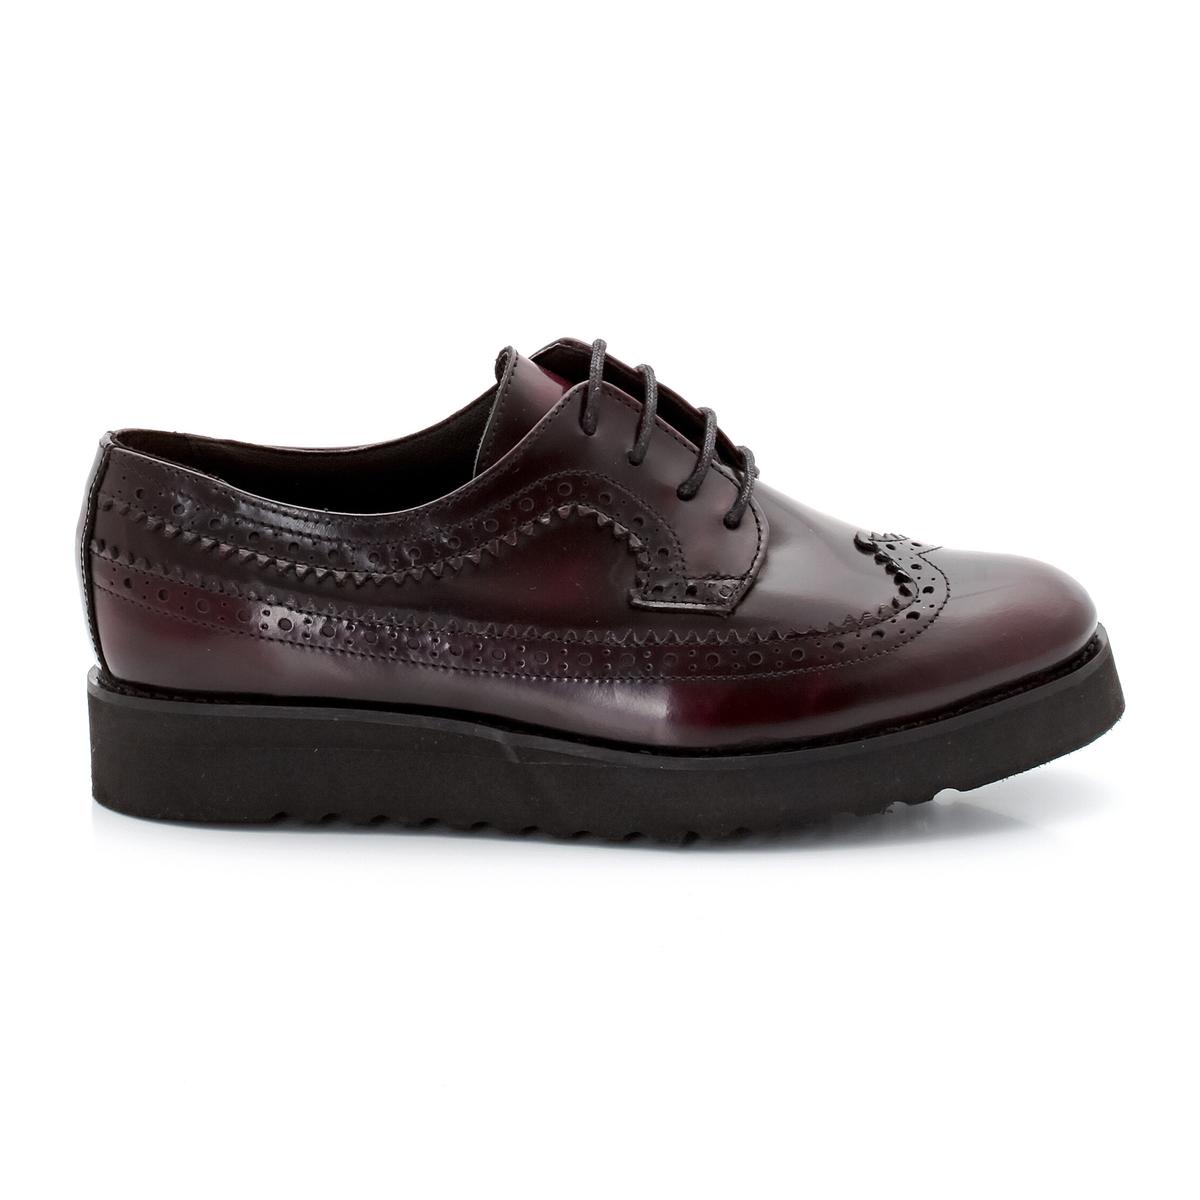 Ботинки-дерби кожаные на танкетке